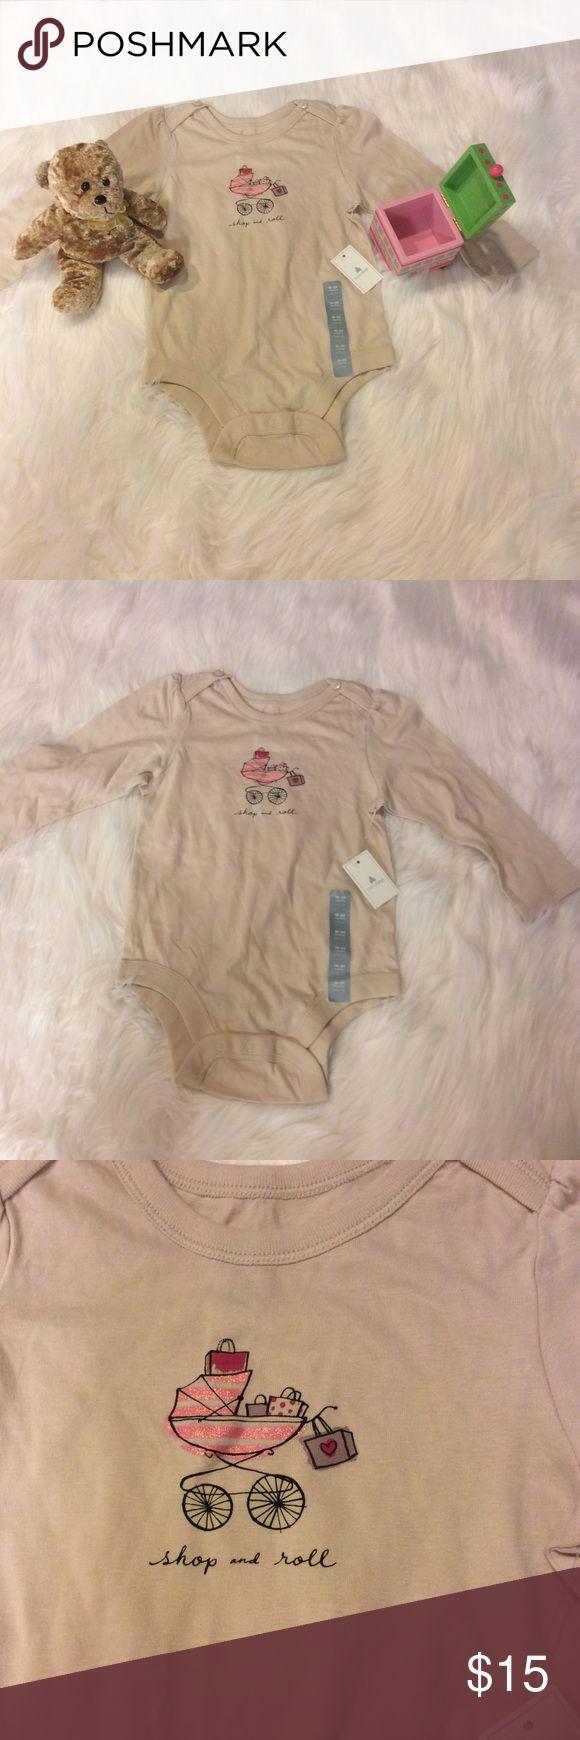 Baby Gap Shop N Roll Onesie Super adorable for your little shopper! GAP One Pieces Bodysuits